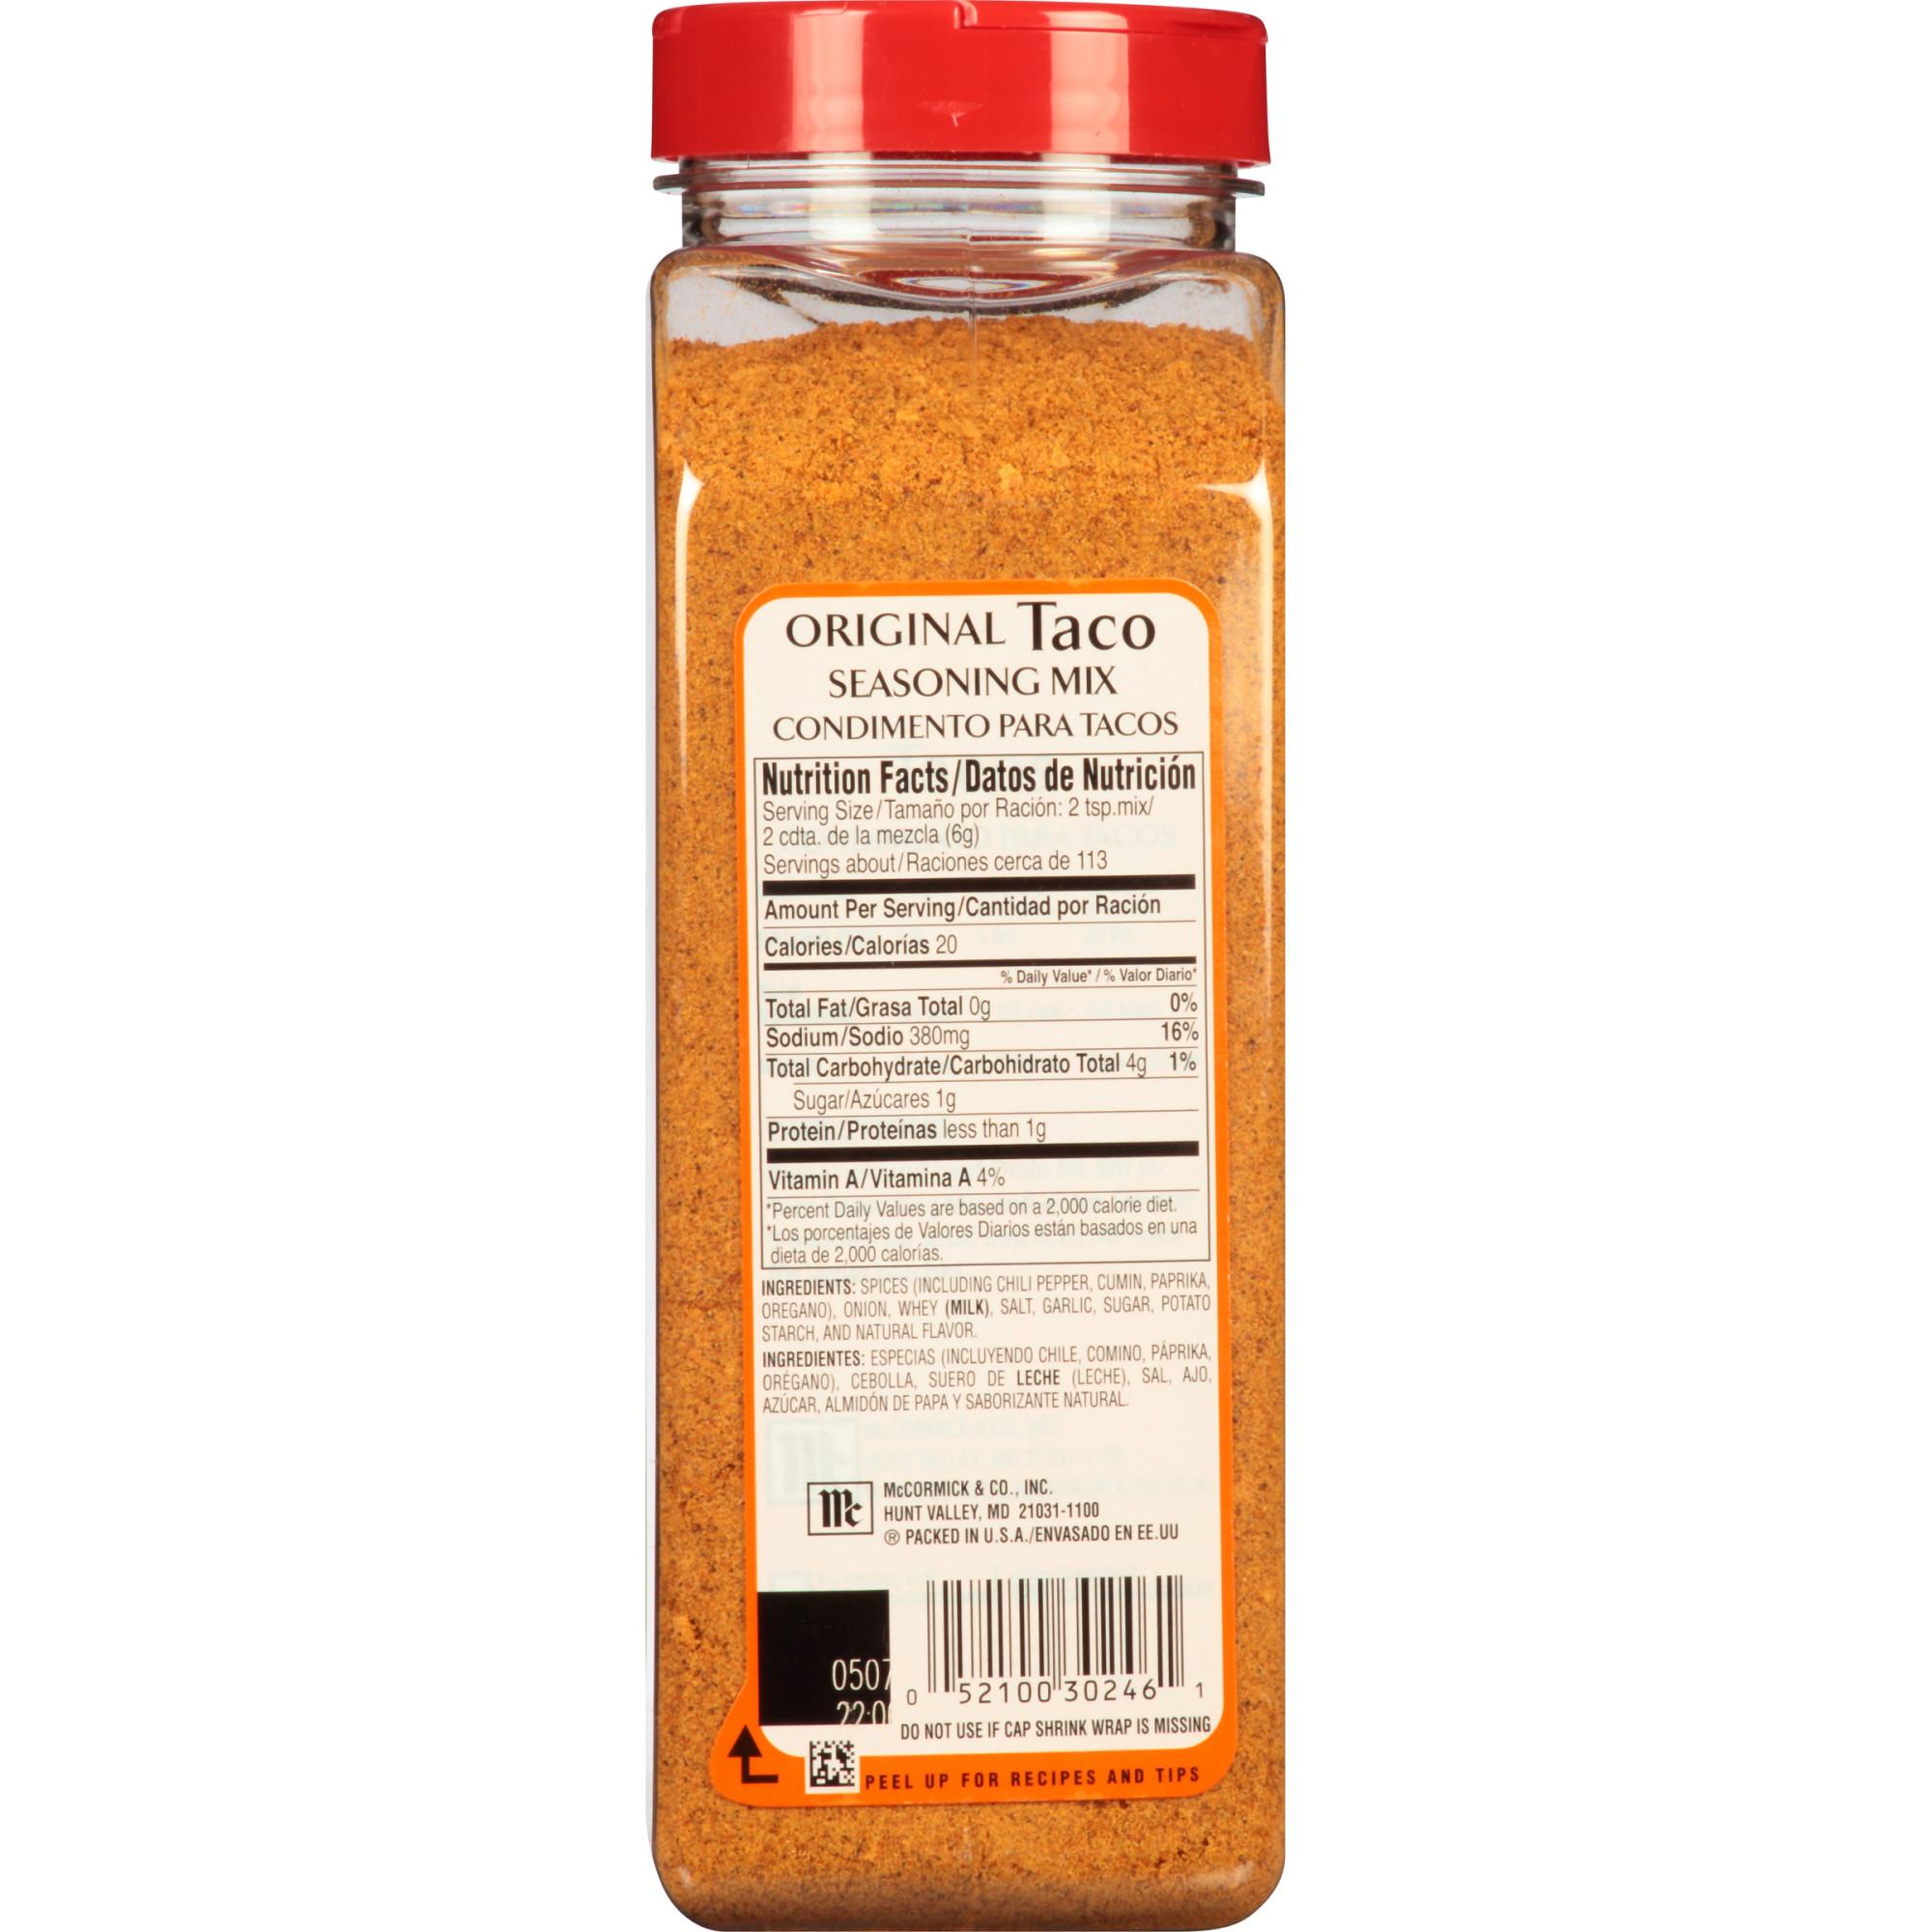 Mccormick Original Taco Seasoning Mix 24 Oz Lazada Ph